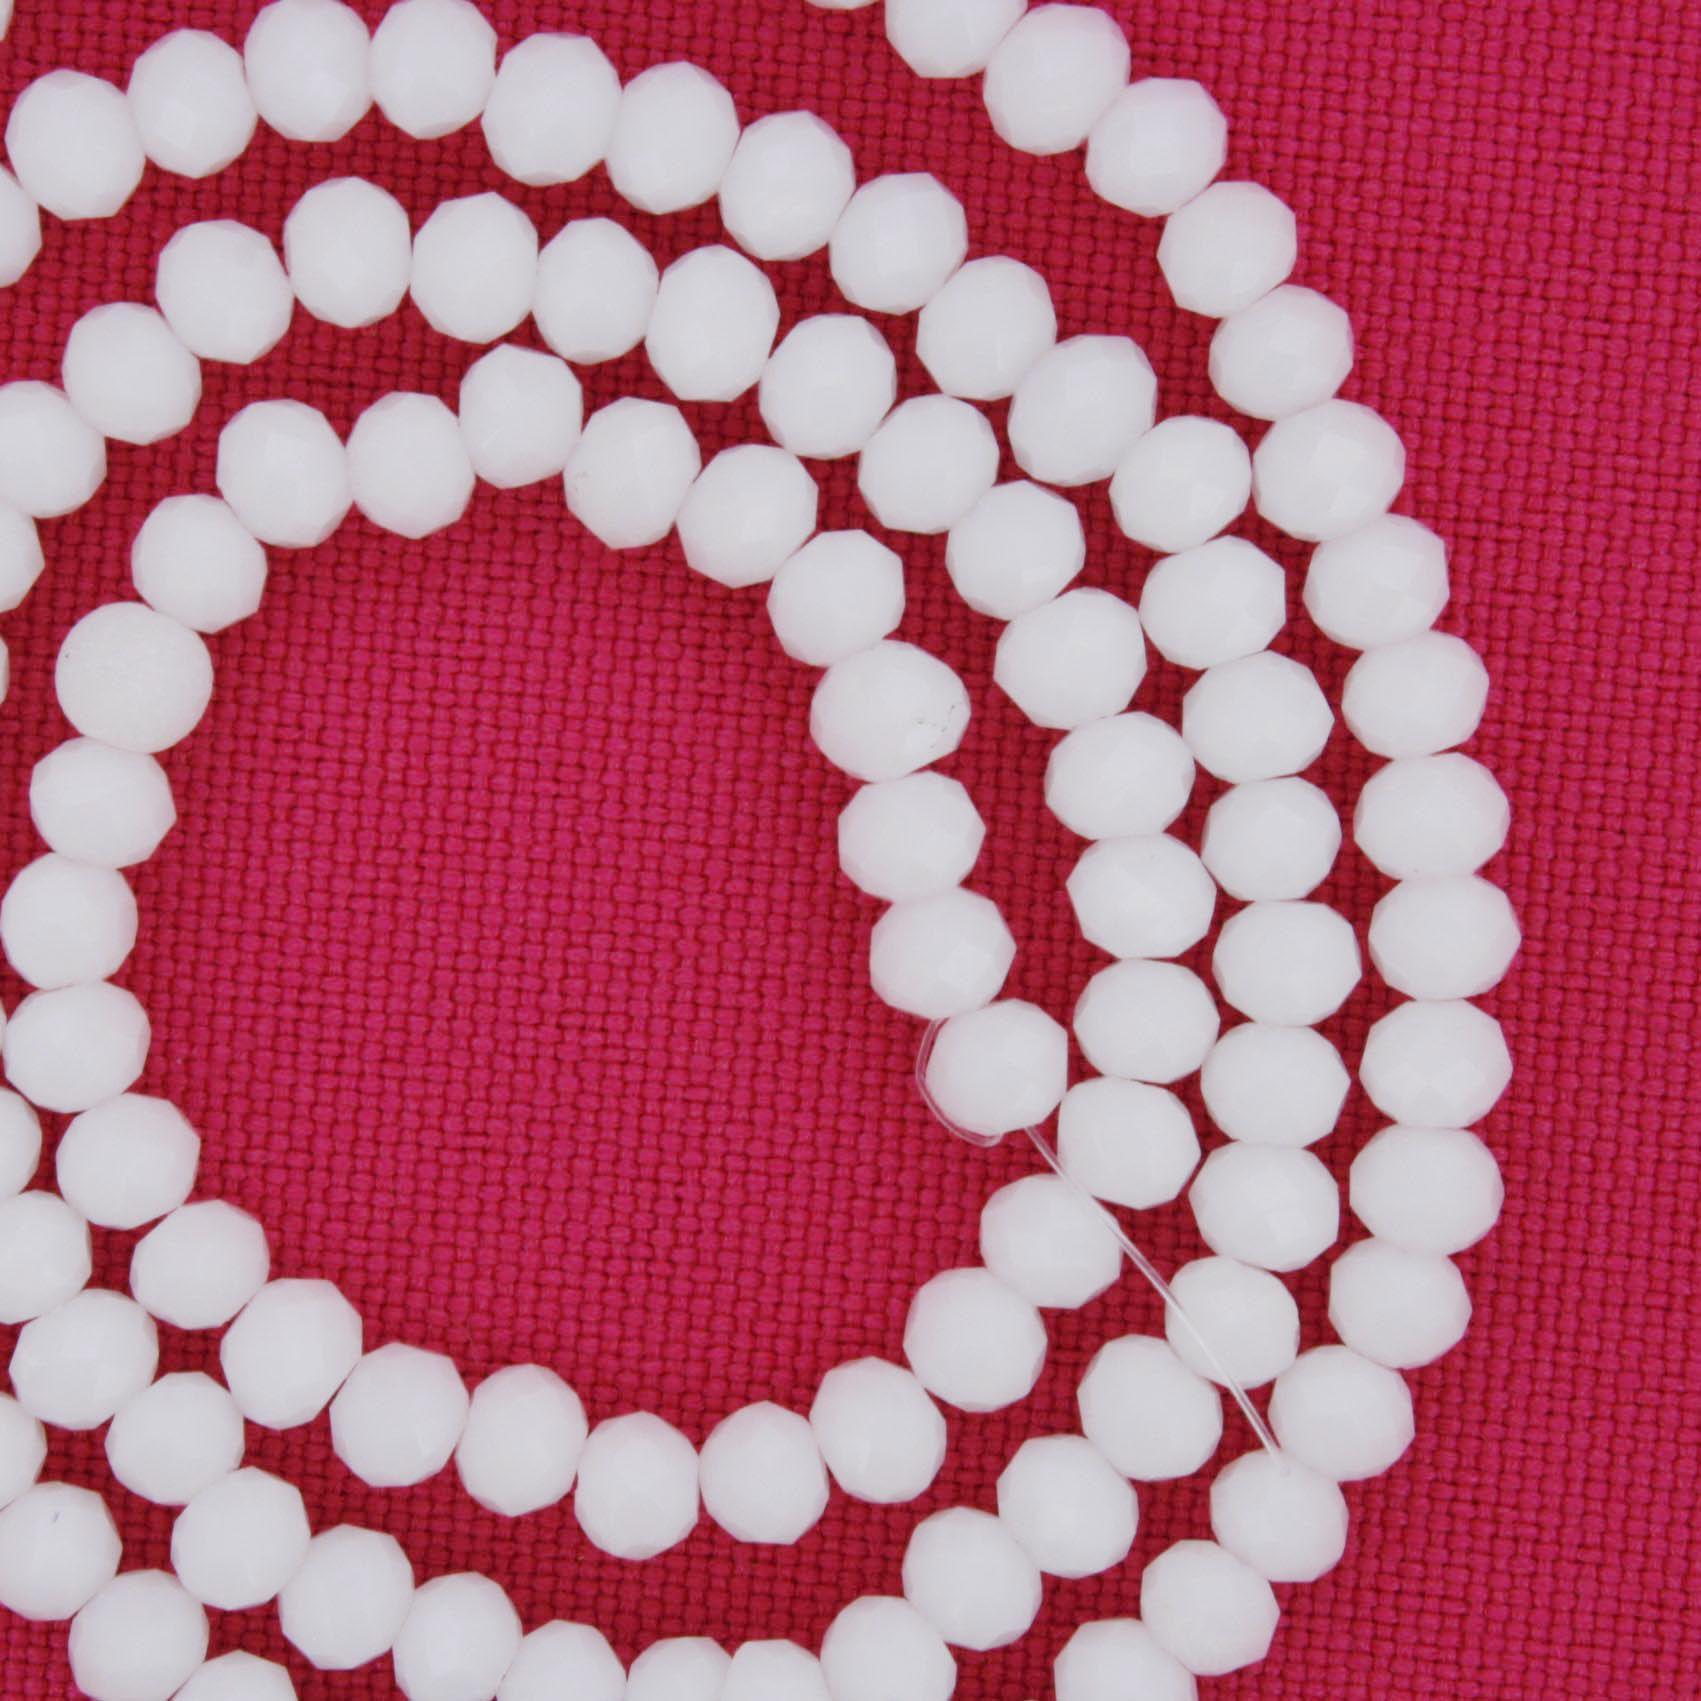 Fio de Cristal - Flat® - Branco - 4mm  - Stéphanie Bijoux® - Peças para Bijuterias e Artesanato